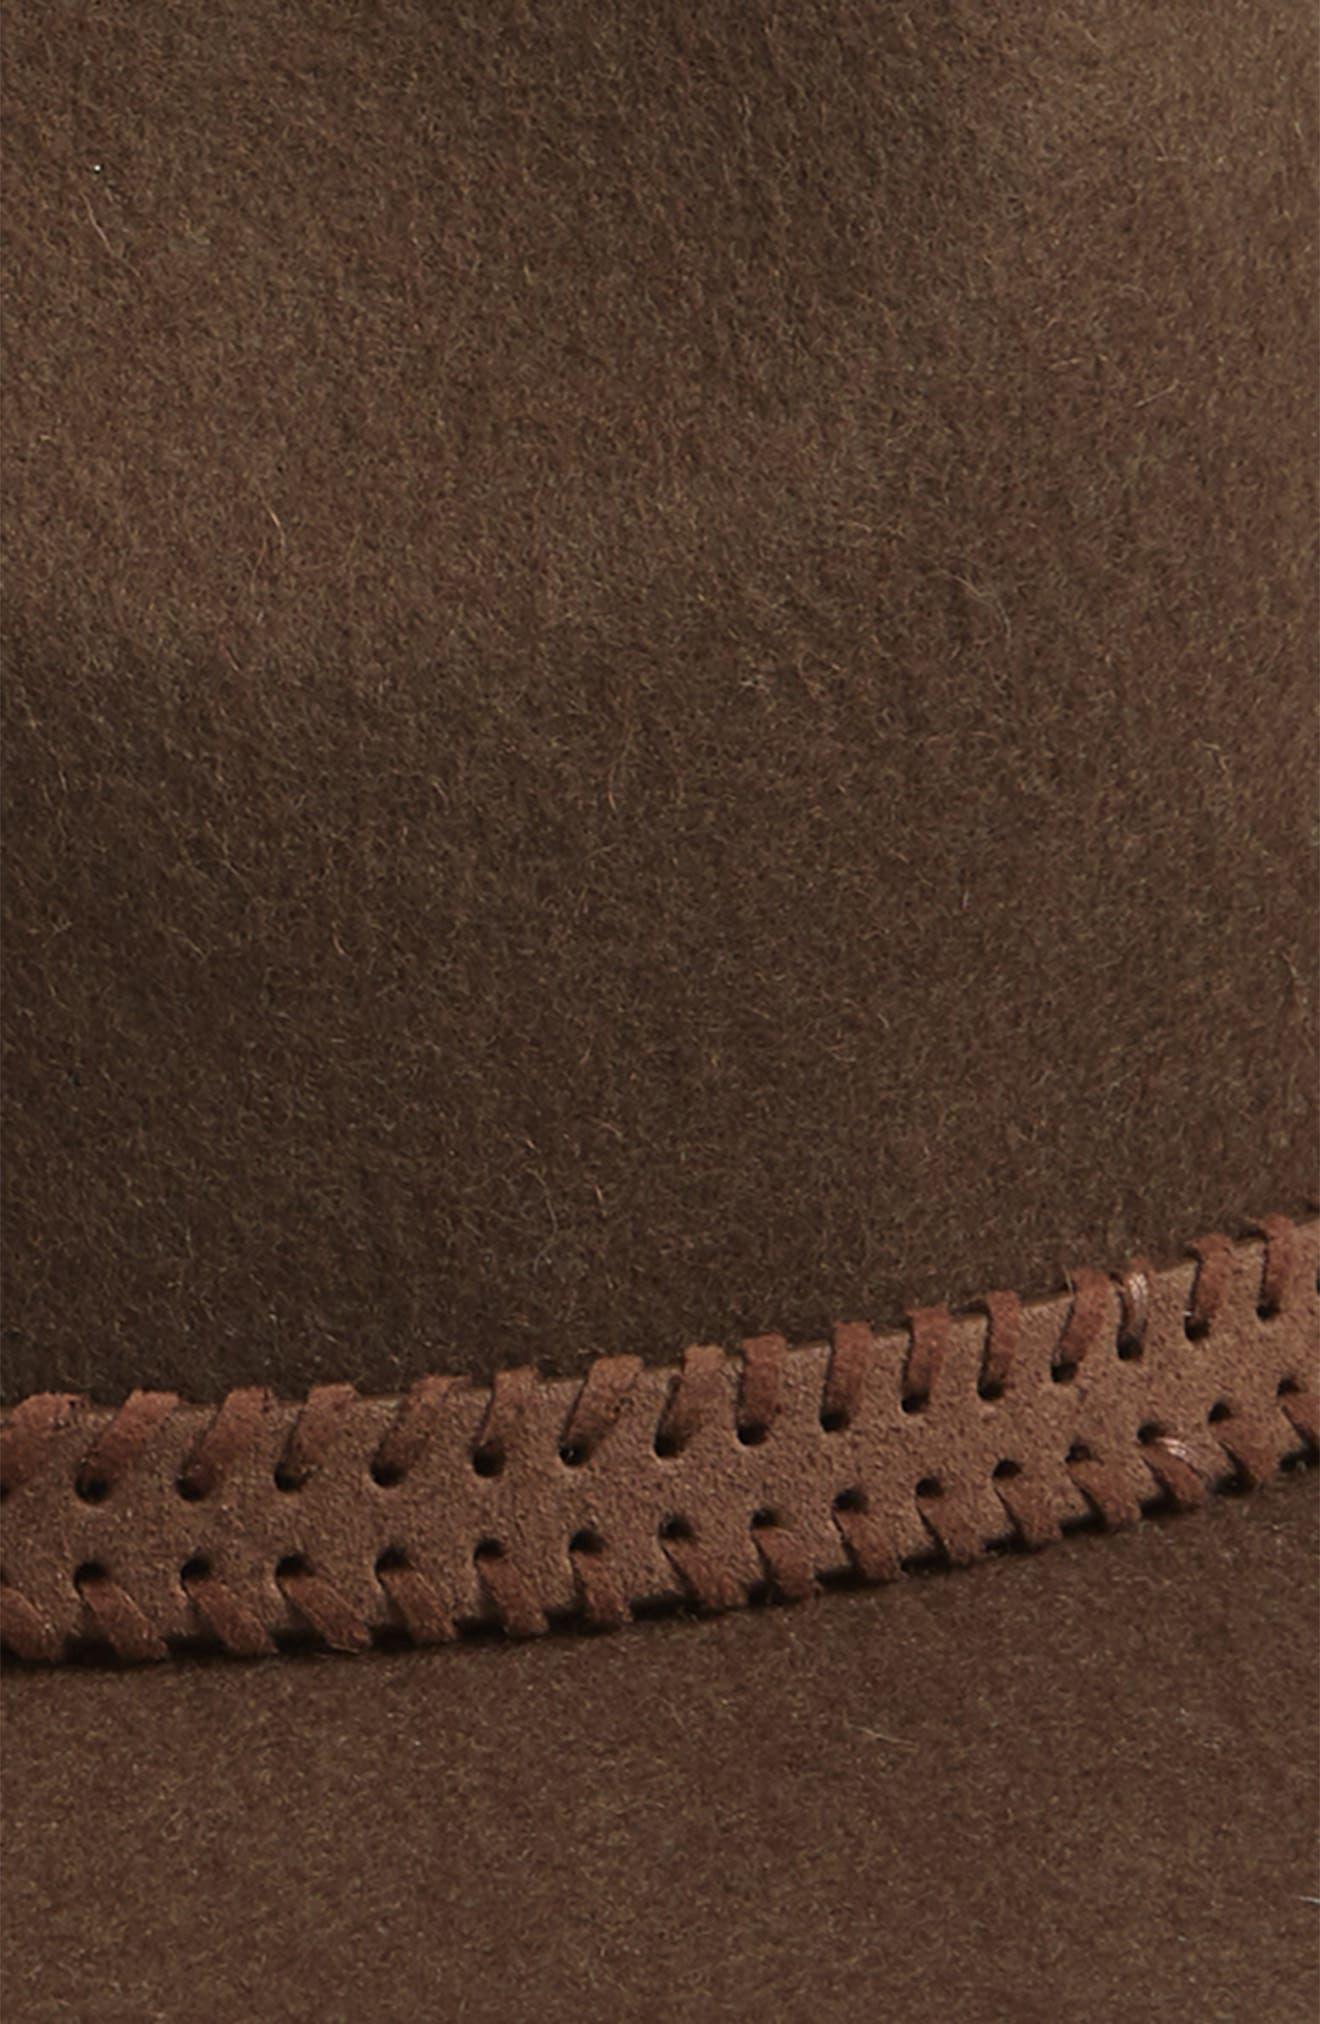 Felt Panama Hat,                             Alternate thumbnail 3, color,                             DARK TAUPE